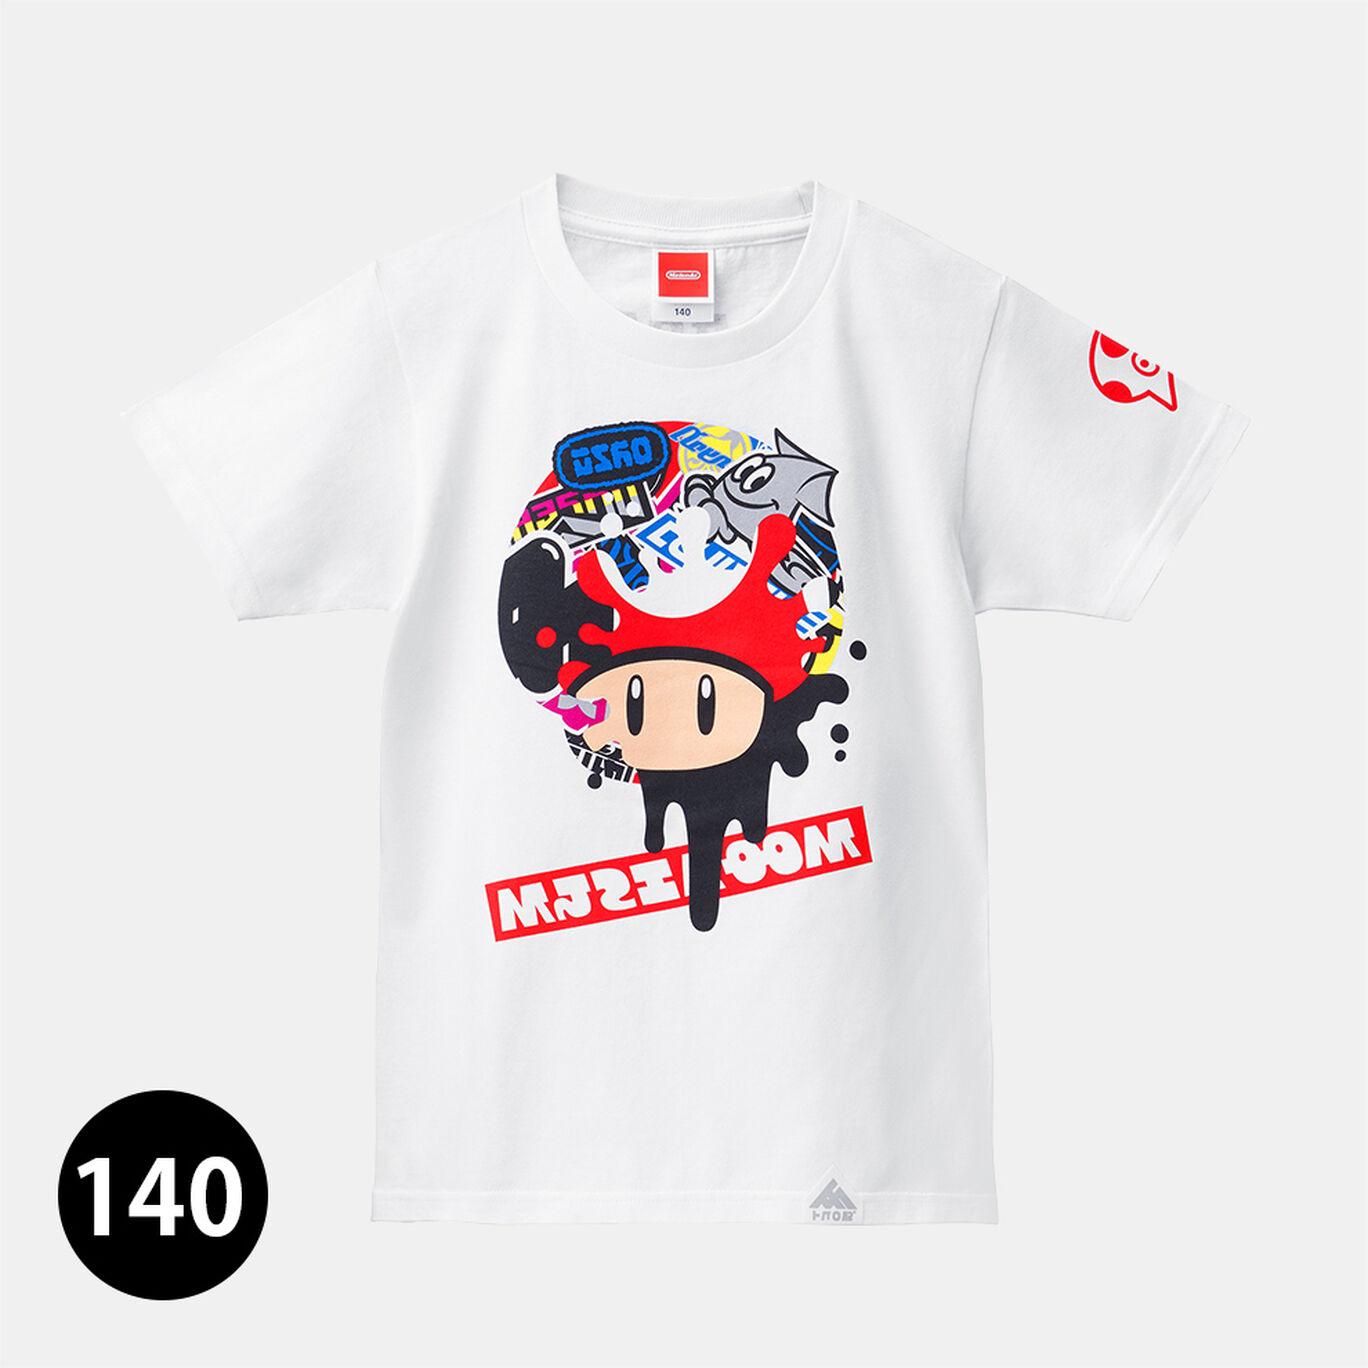 【140cmサイズ】スプラトゥーン2 フェスTシャツ スーパーキノコ【12月下旬以降お届け】